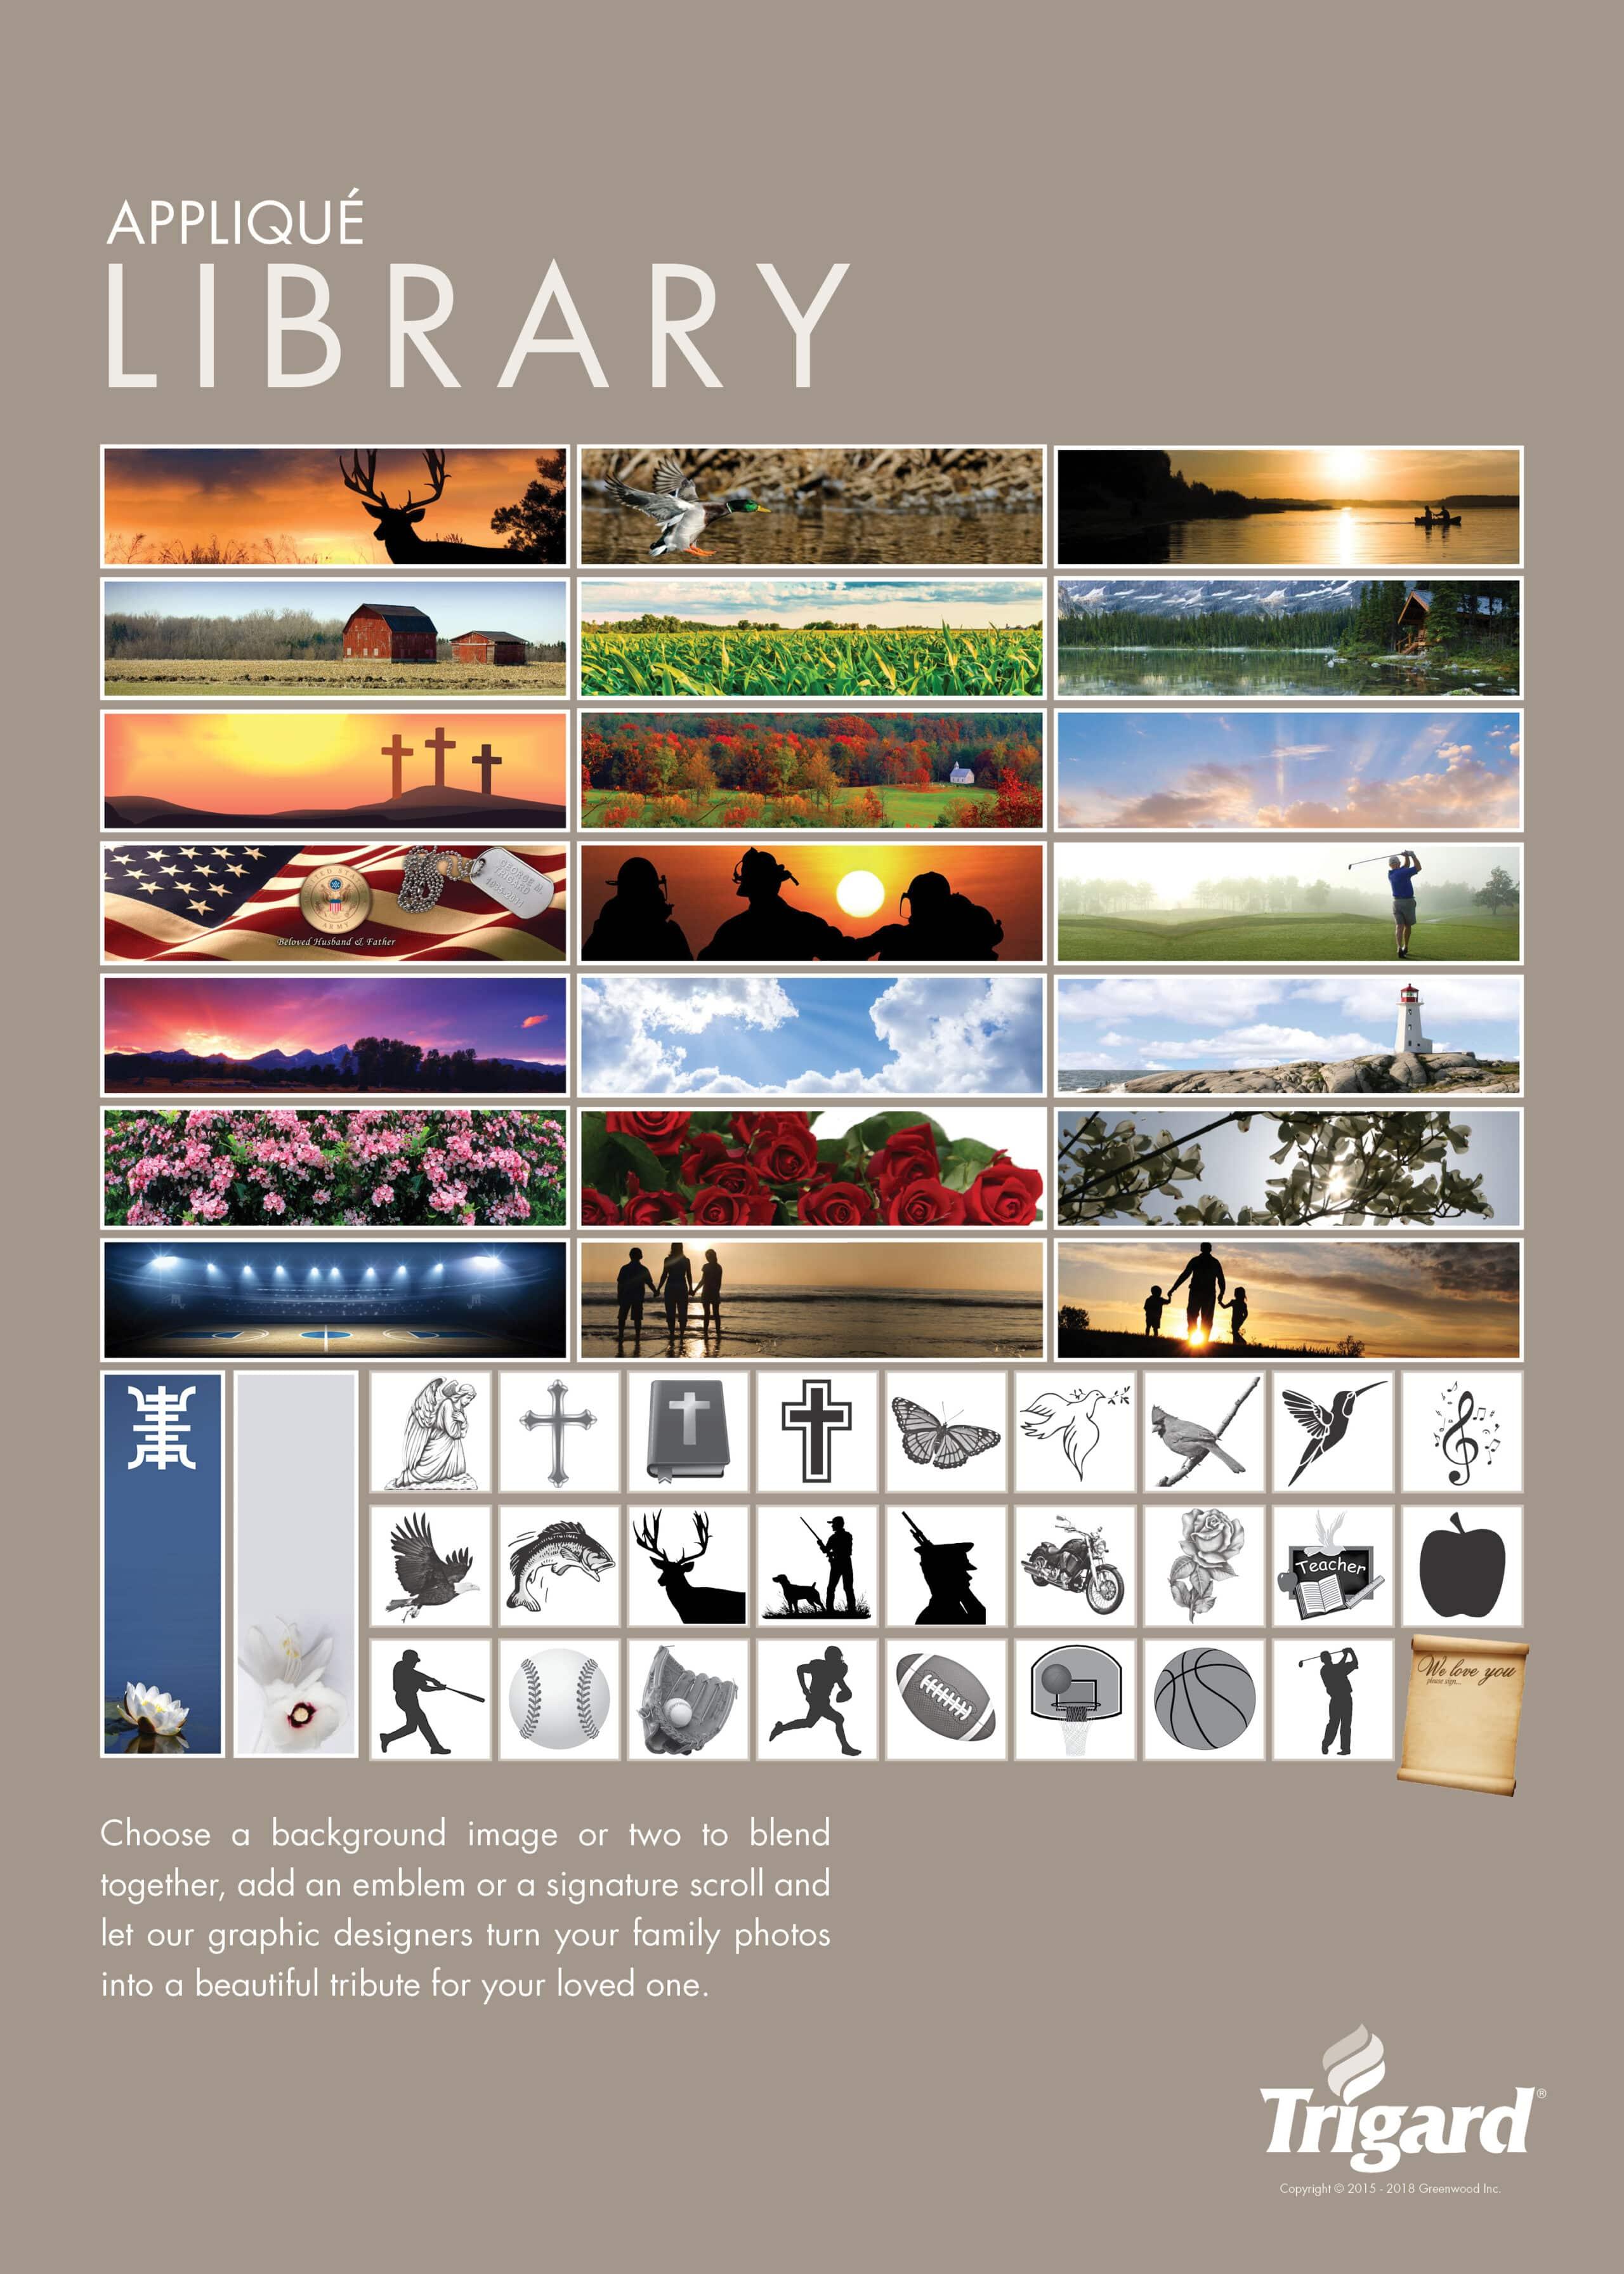 Applique Poster Library